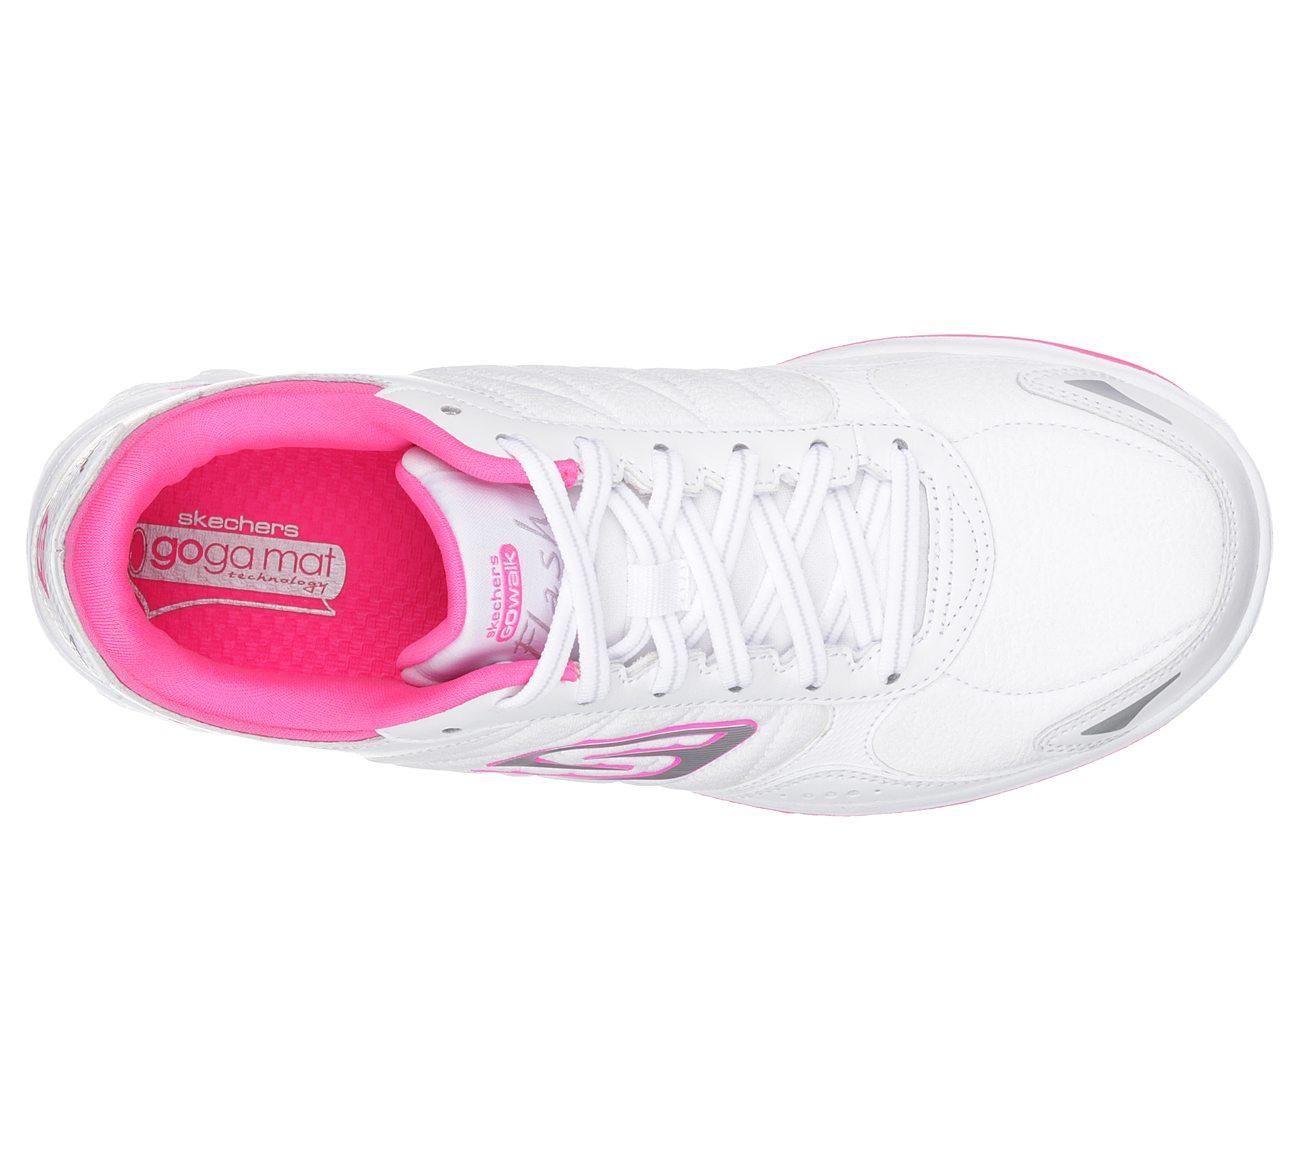 Skechers GOwalk 2 Flash LT